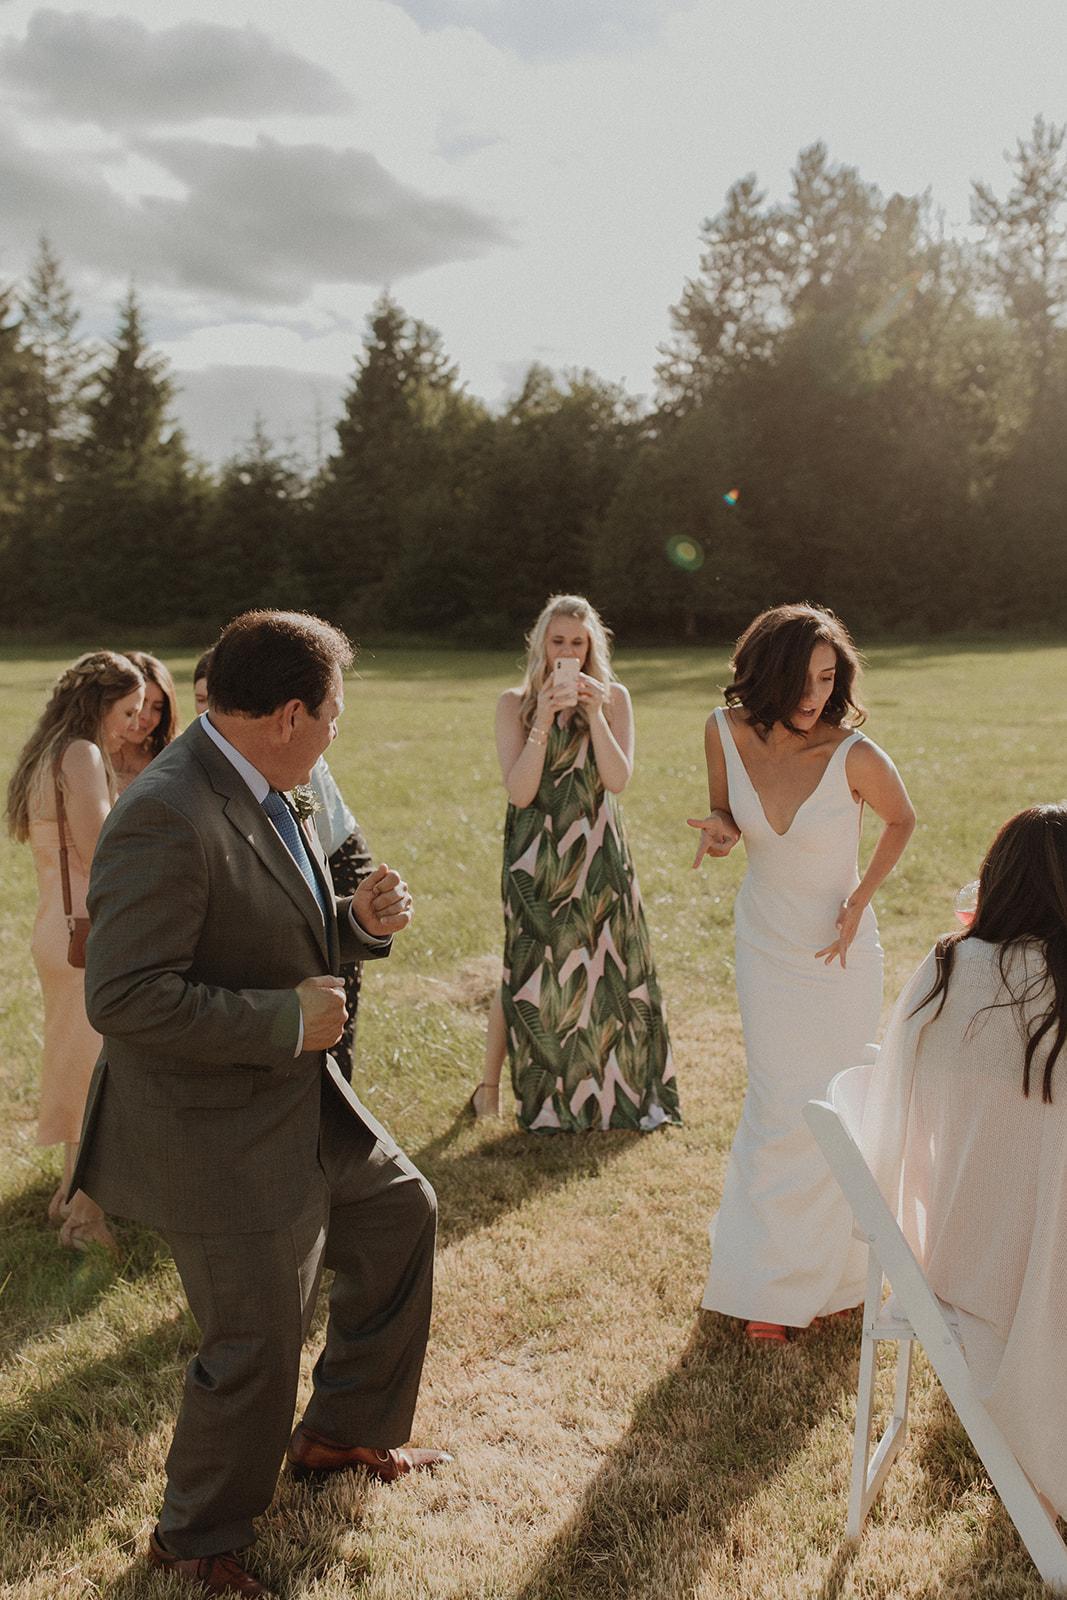 cortney_skye_wedding_june2019-601.jpg